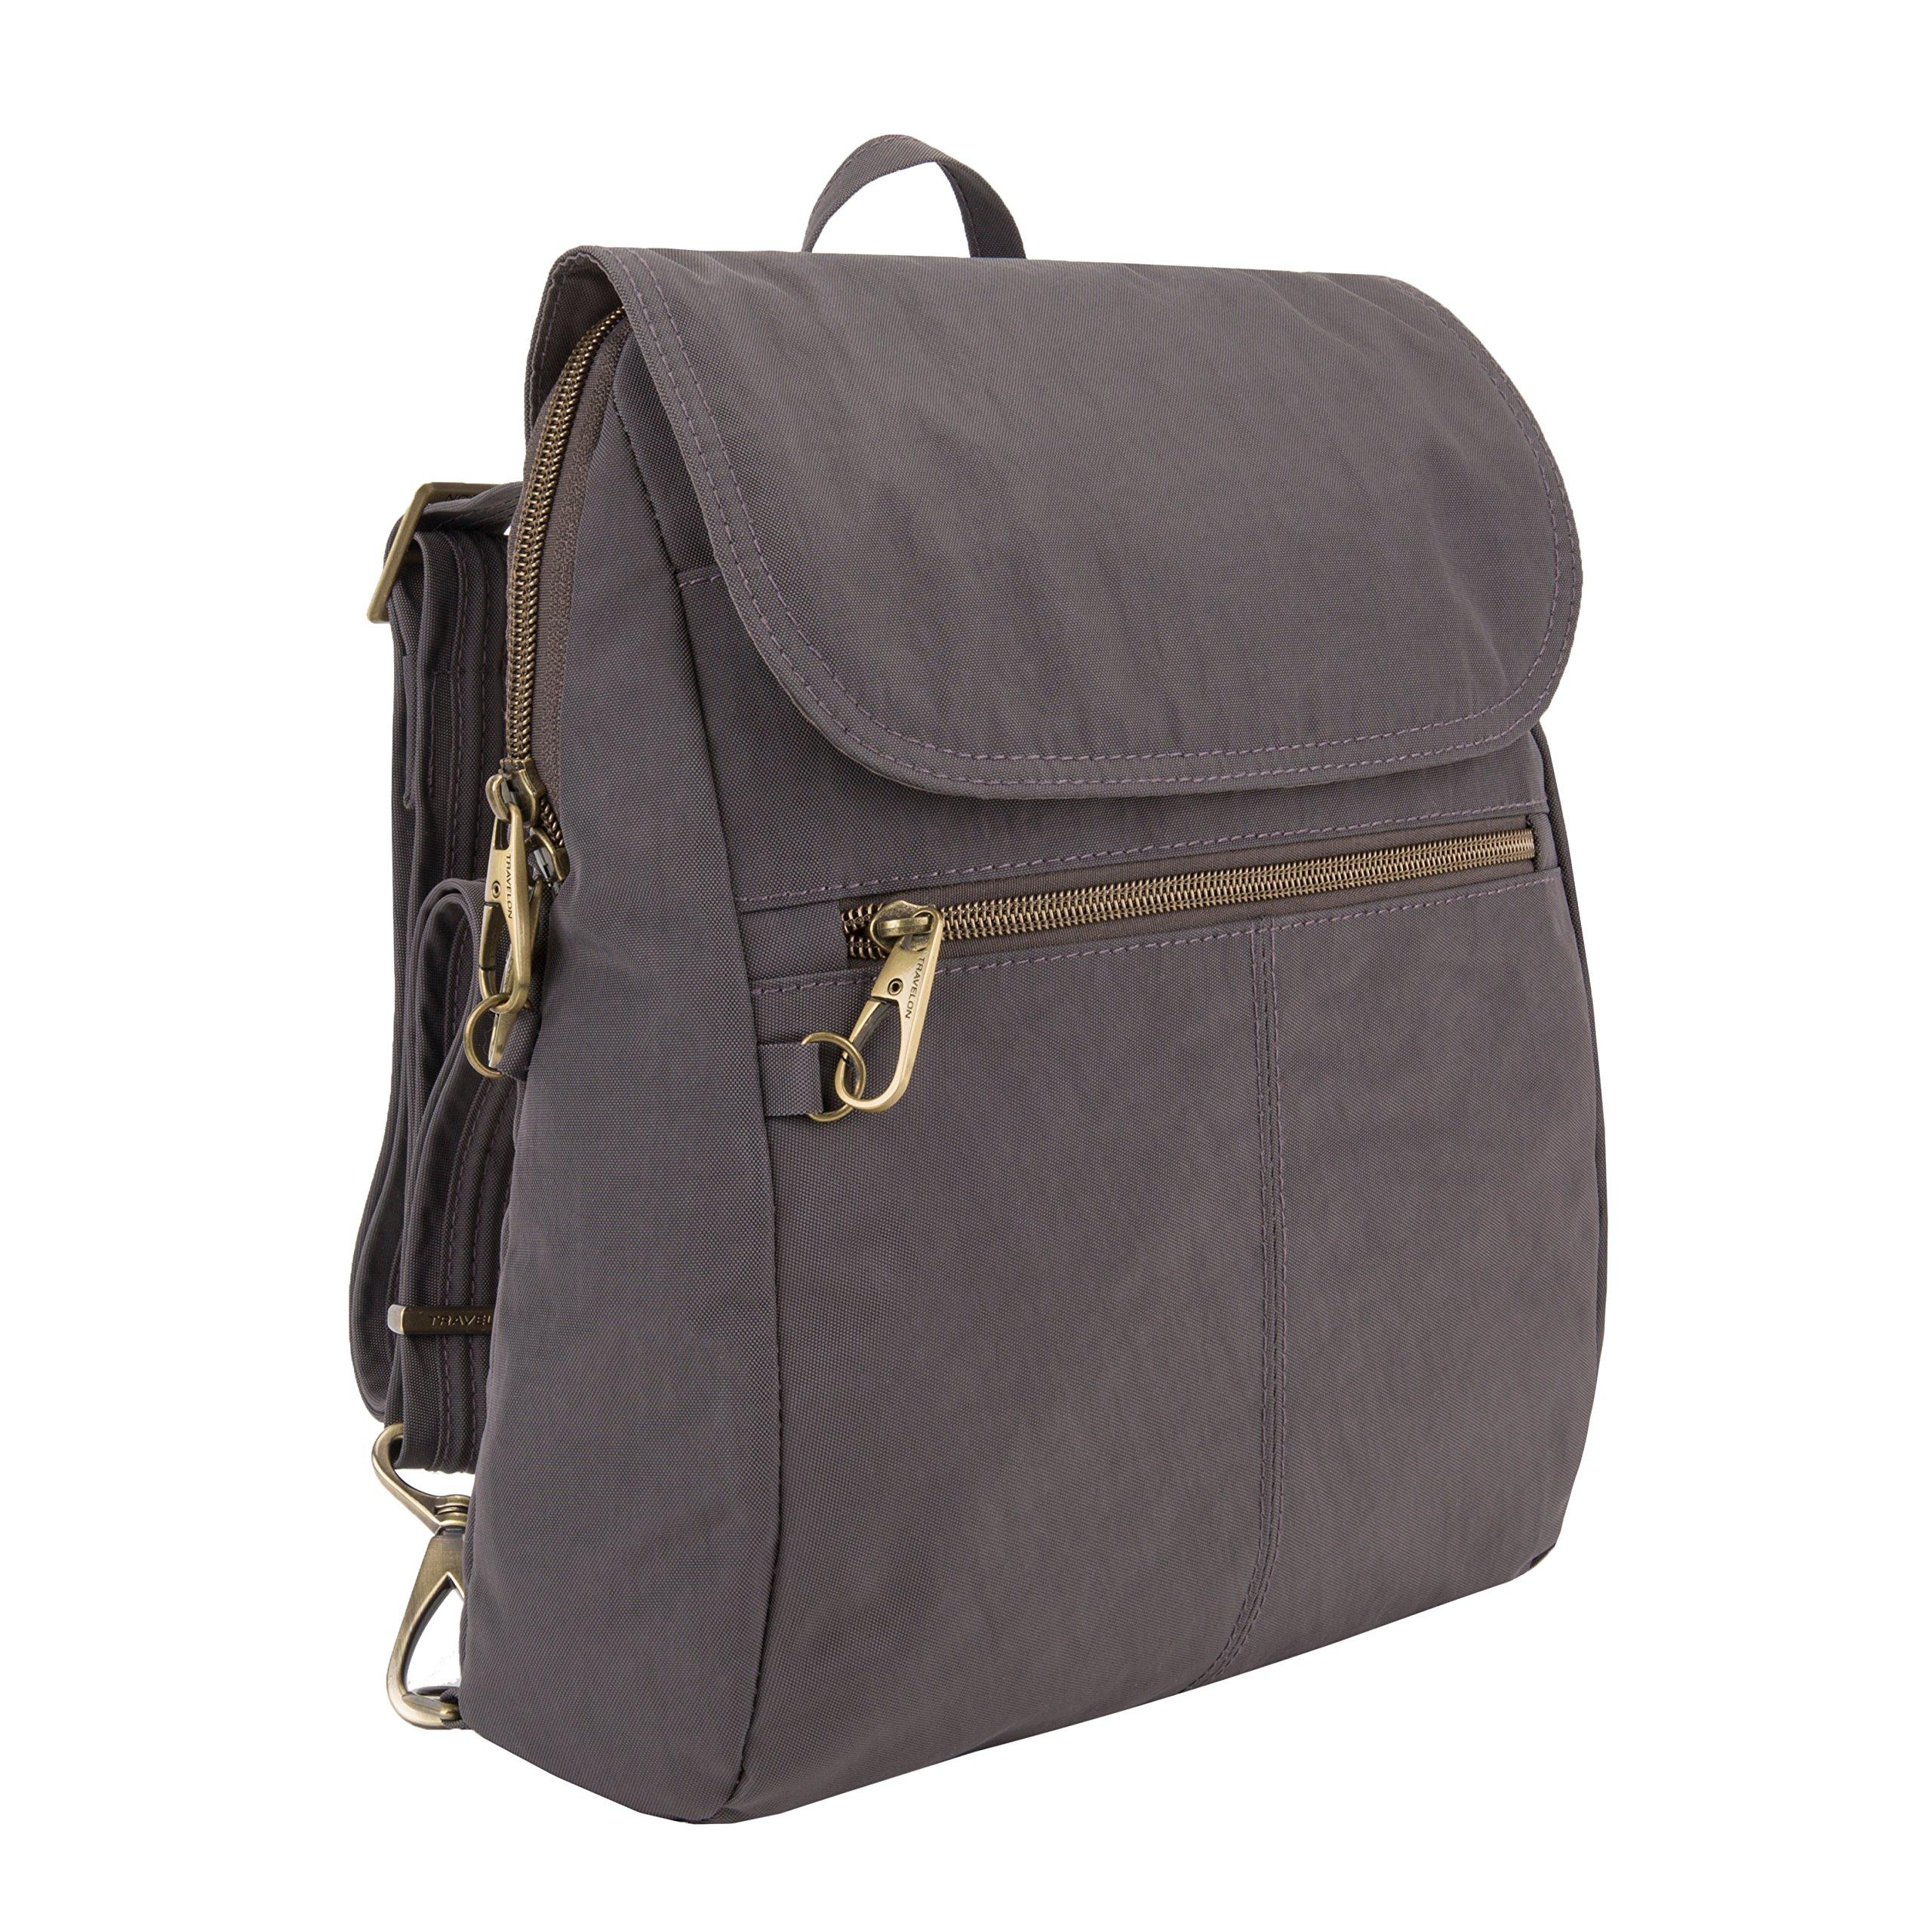 Travelon Anti-theft Signature Slim Backpack, Smoke by Travelon